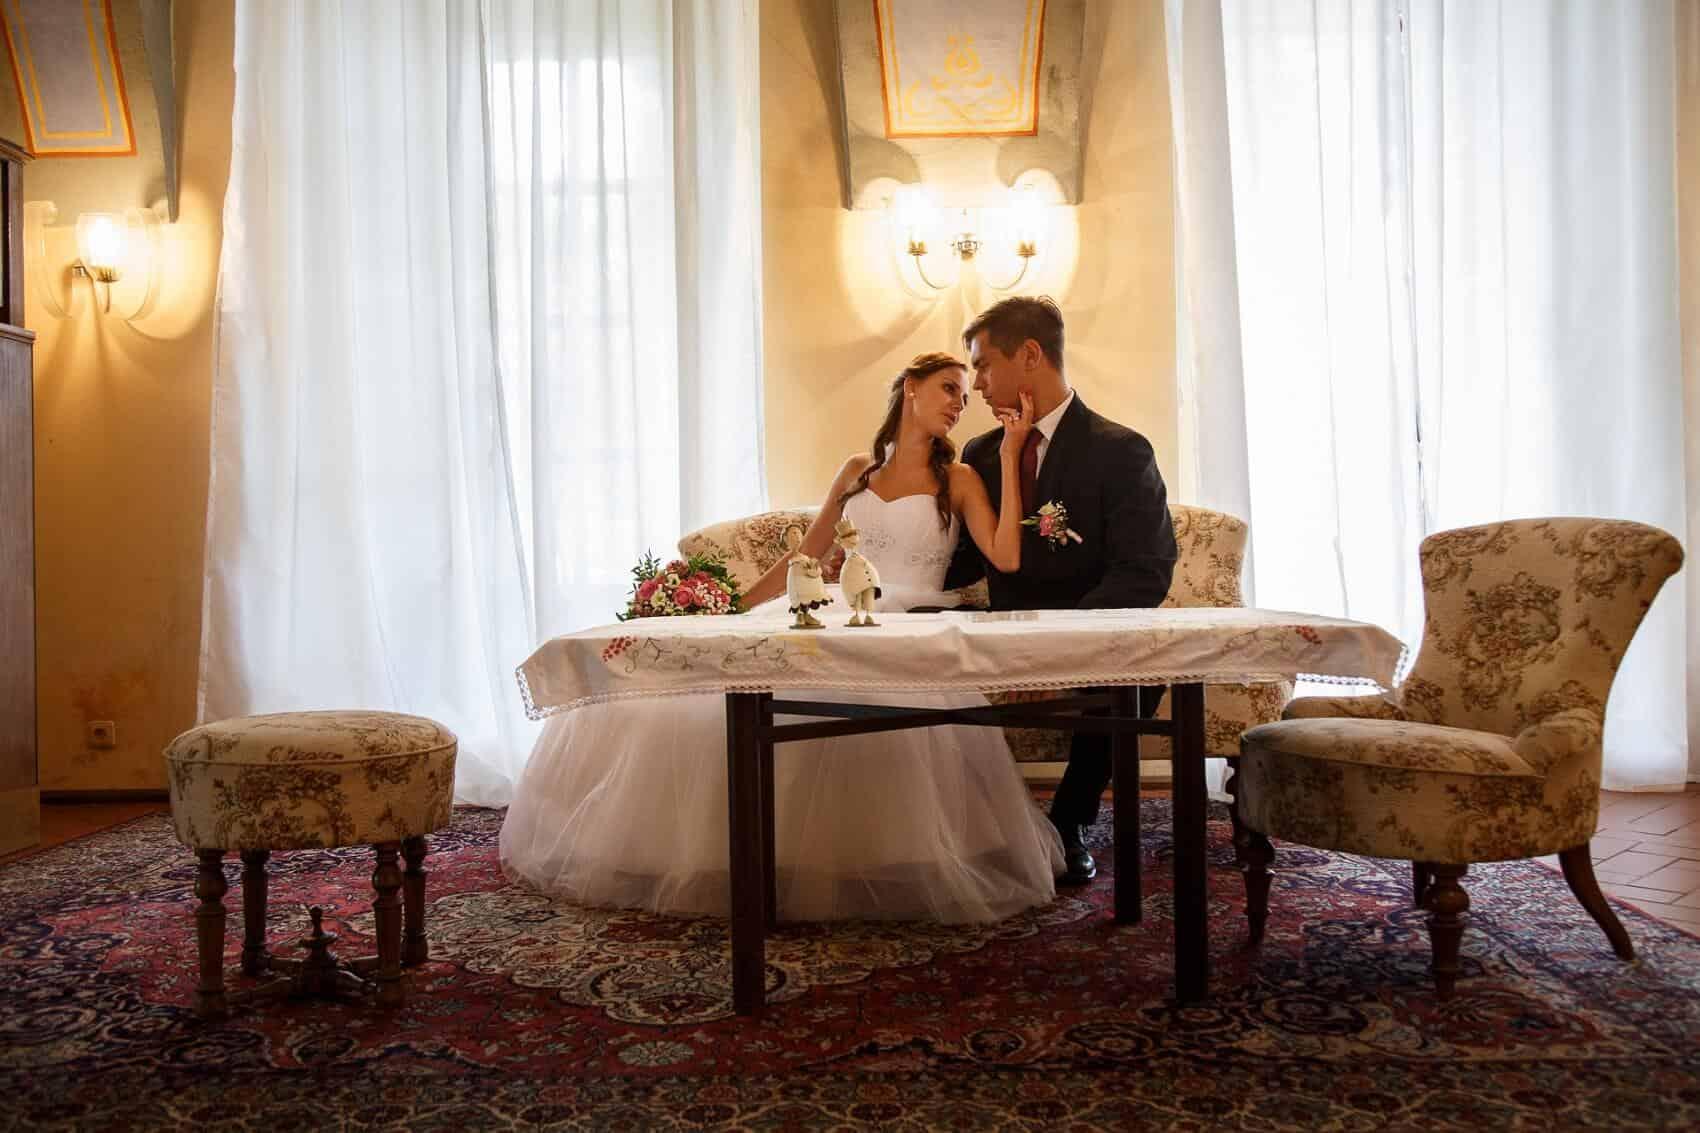 Fotograf Radek Vandara novomanželé na zámku